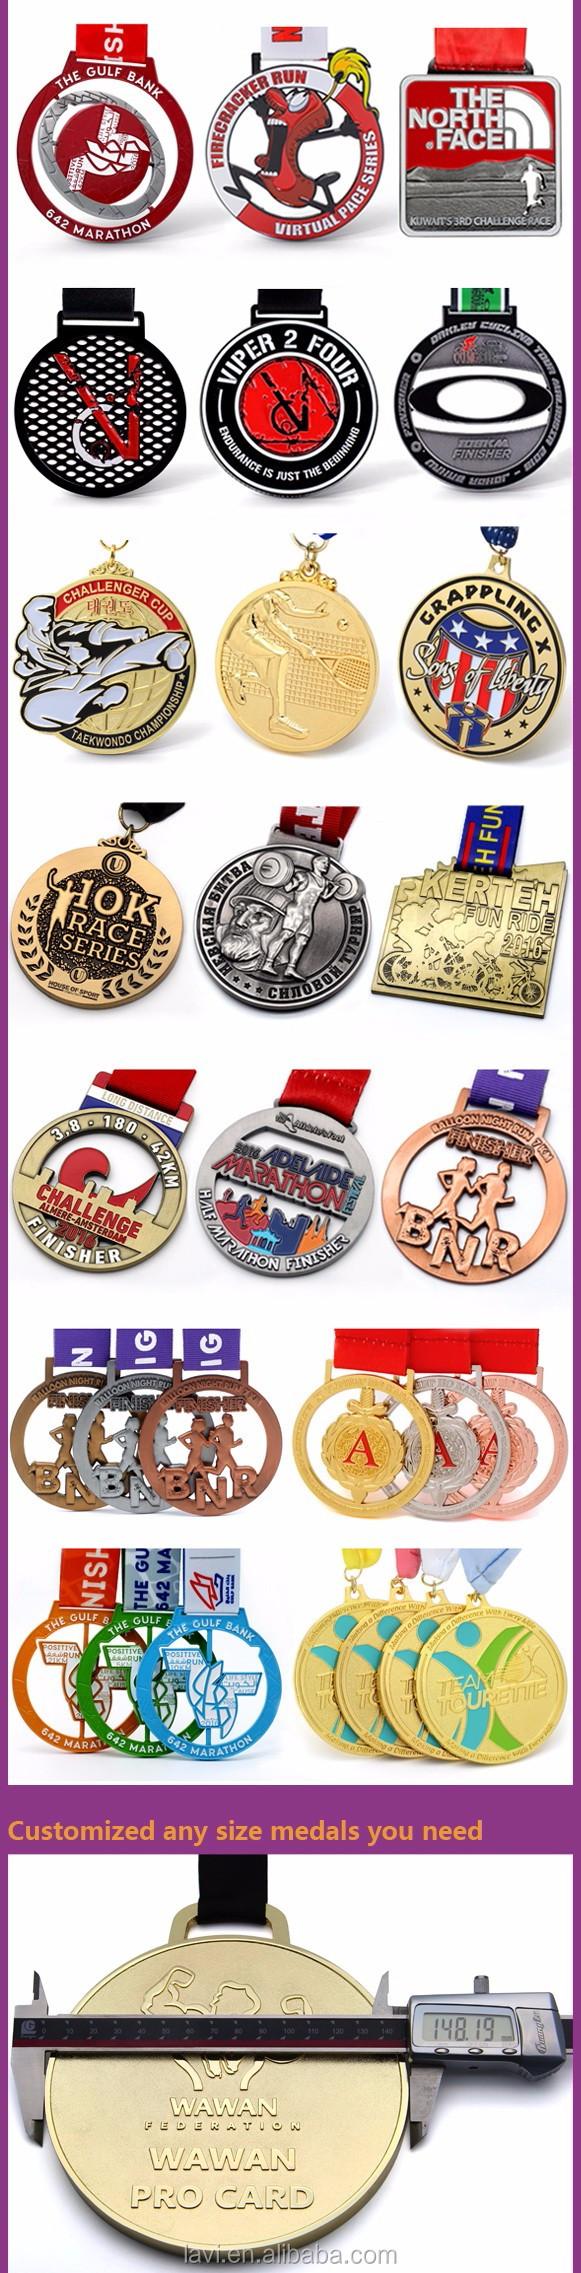 2wholesale jiu jitsu medal.jpg